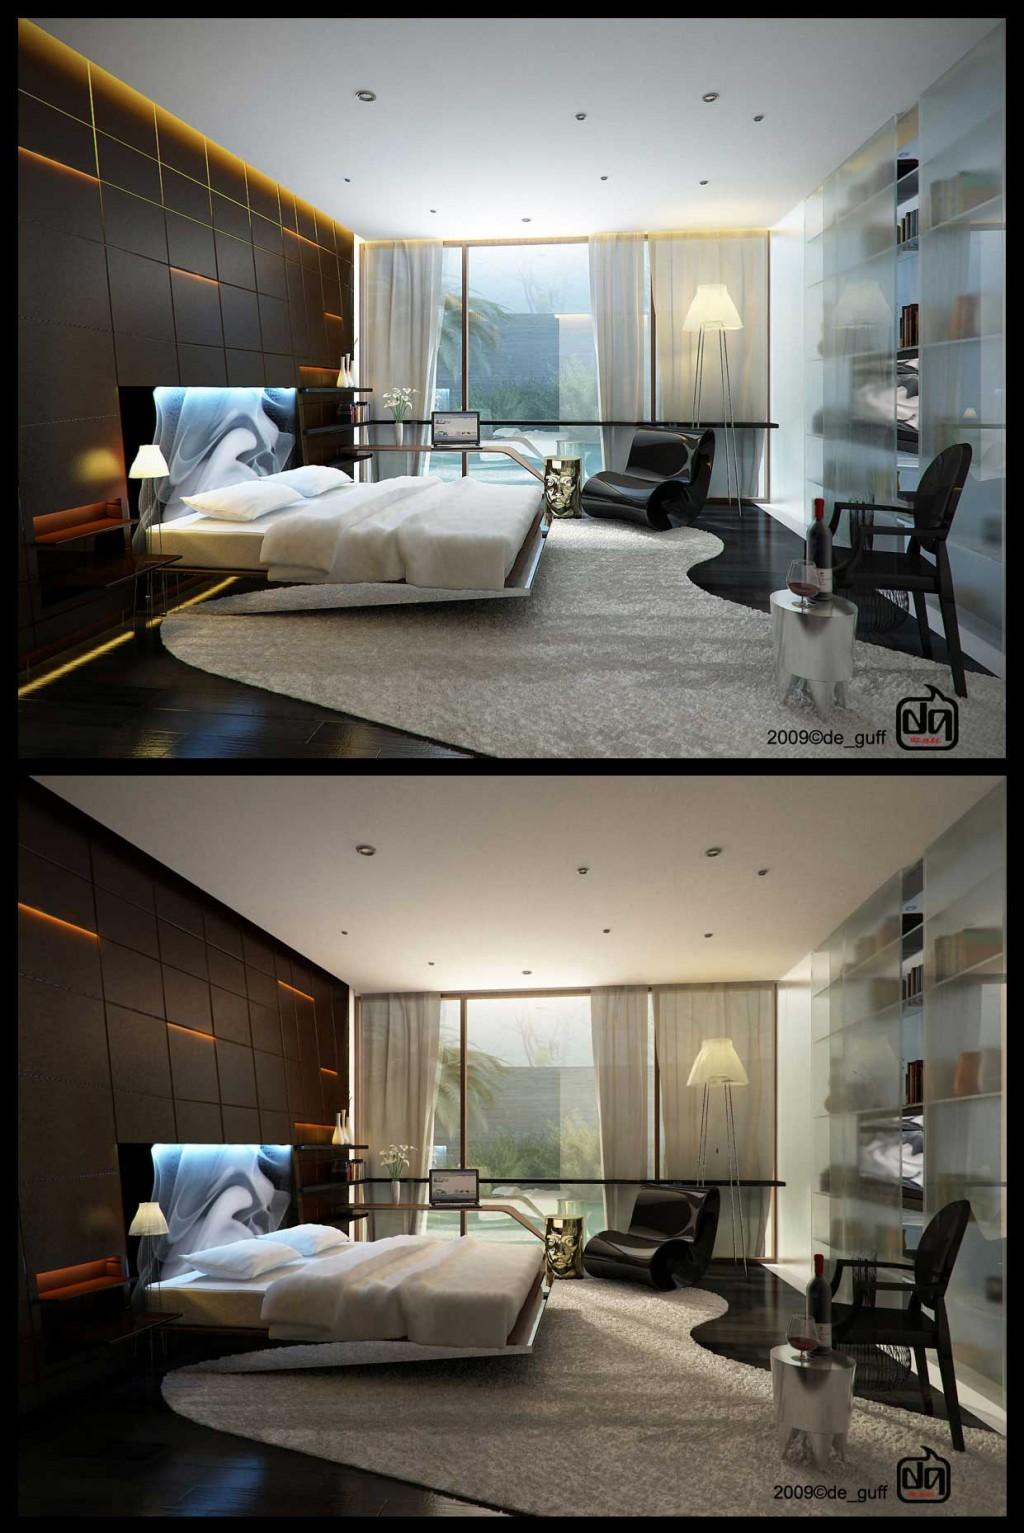 Cool Bedroom Accent Lighting Beautiful Area Rug